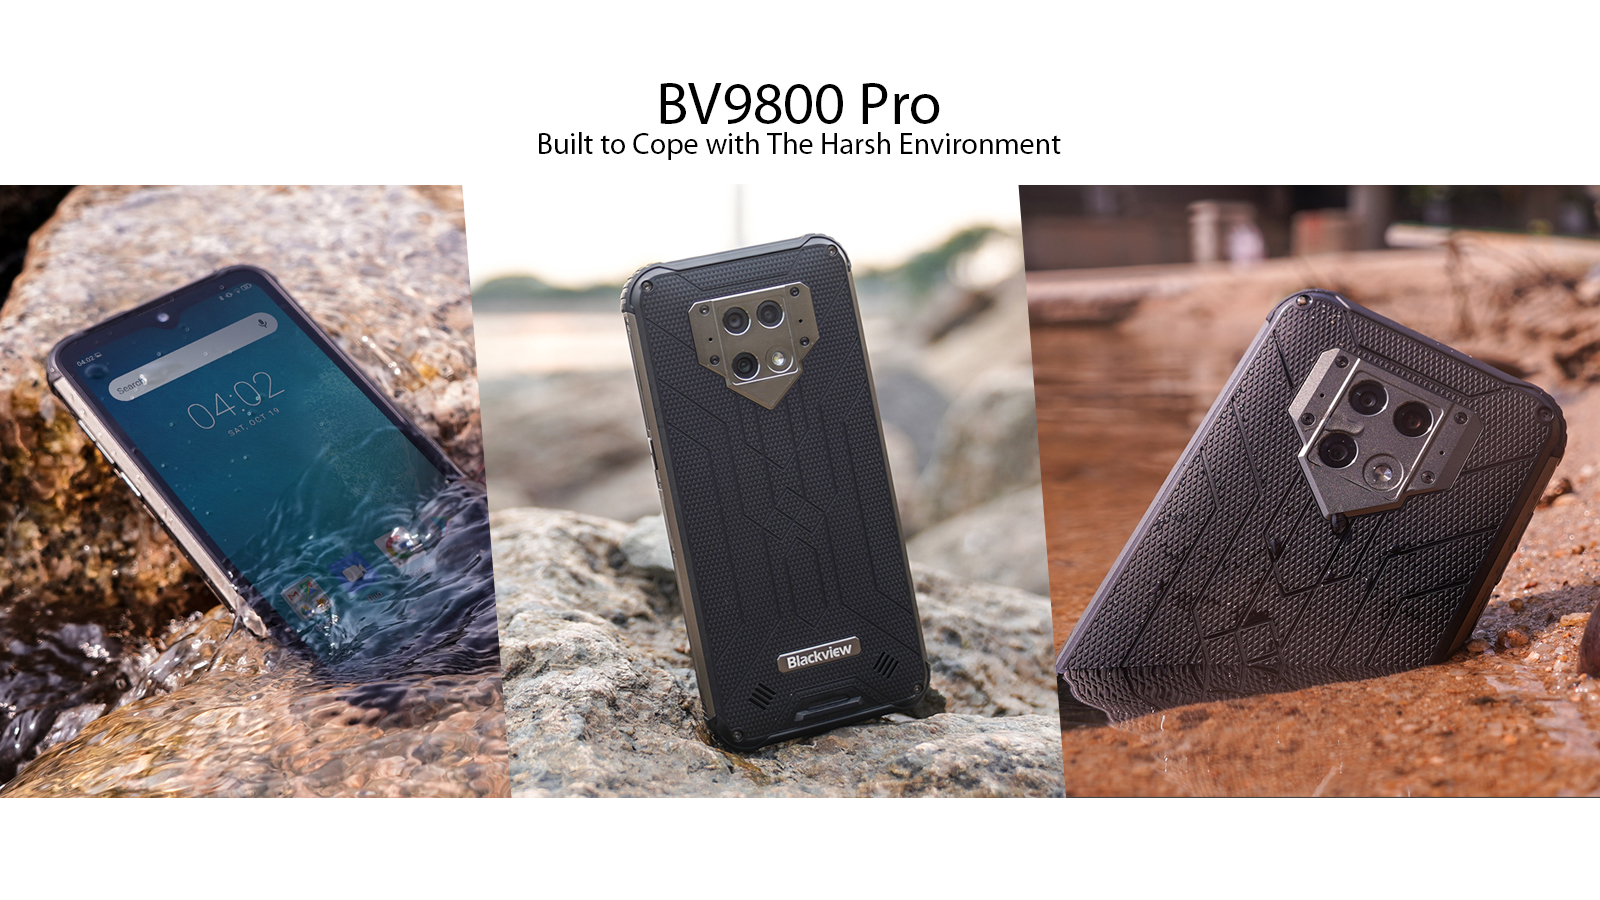 Обзор blackview bv9800: характеристики, отзывы и фото